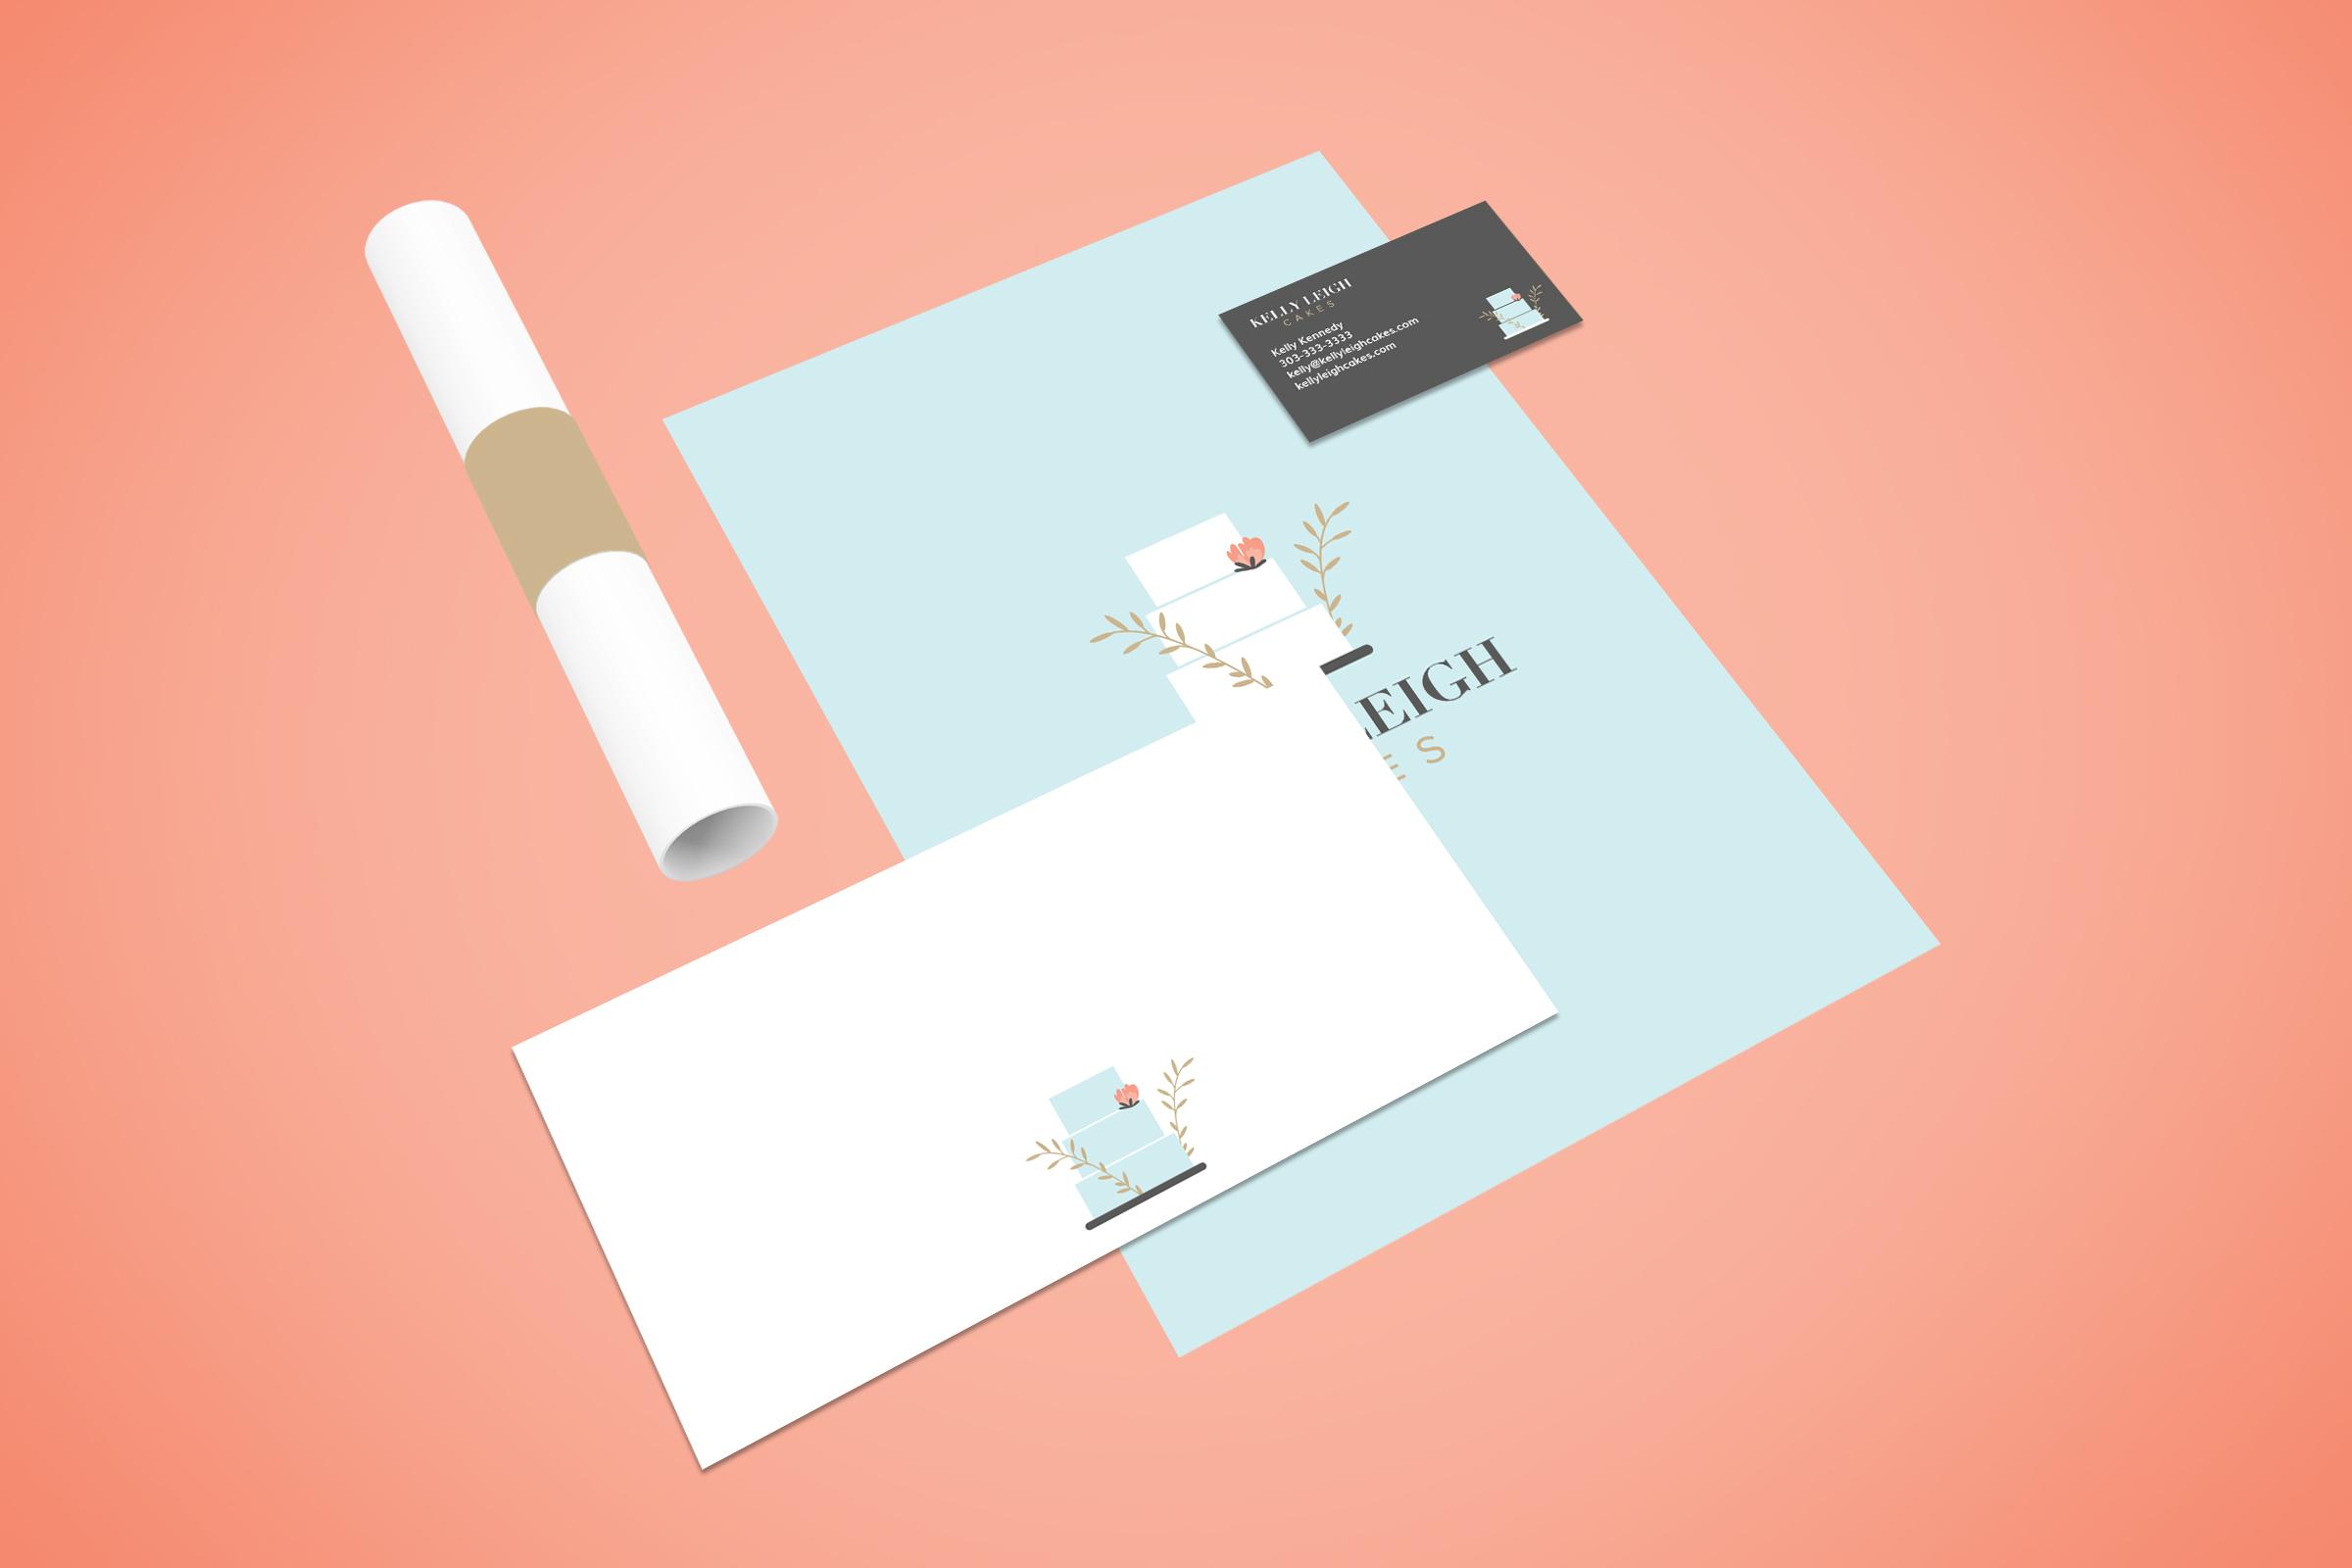 hearthfire-creative-logo-brand-identity-designer-denver-colorado-kelly-leigh-cakes-1.jpg